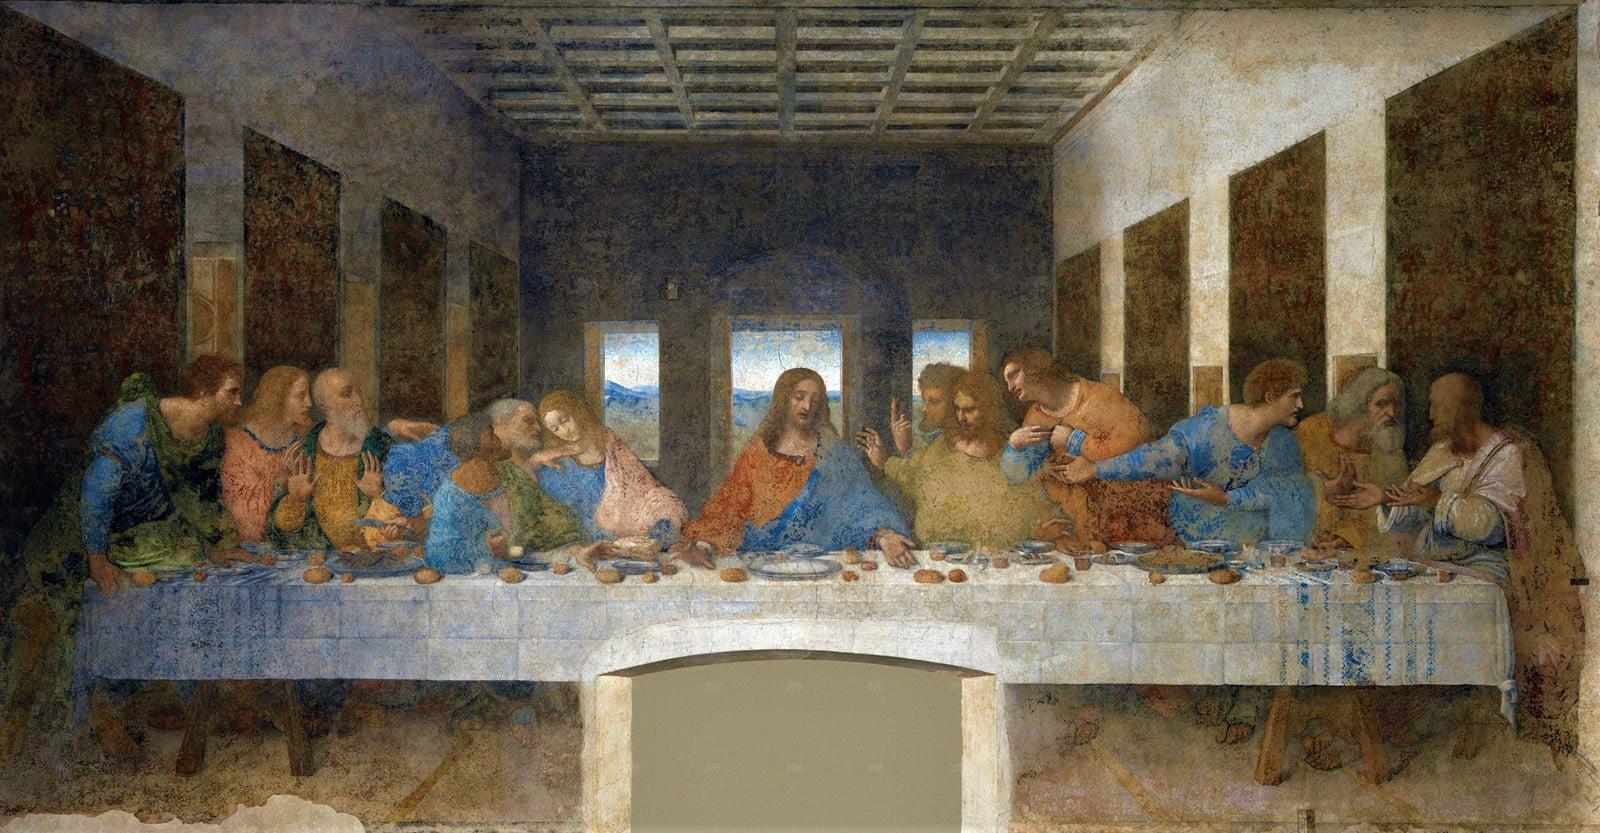 Famous Artworks by Leonardo da Vinci